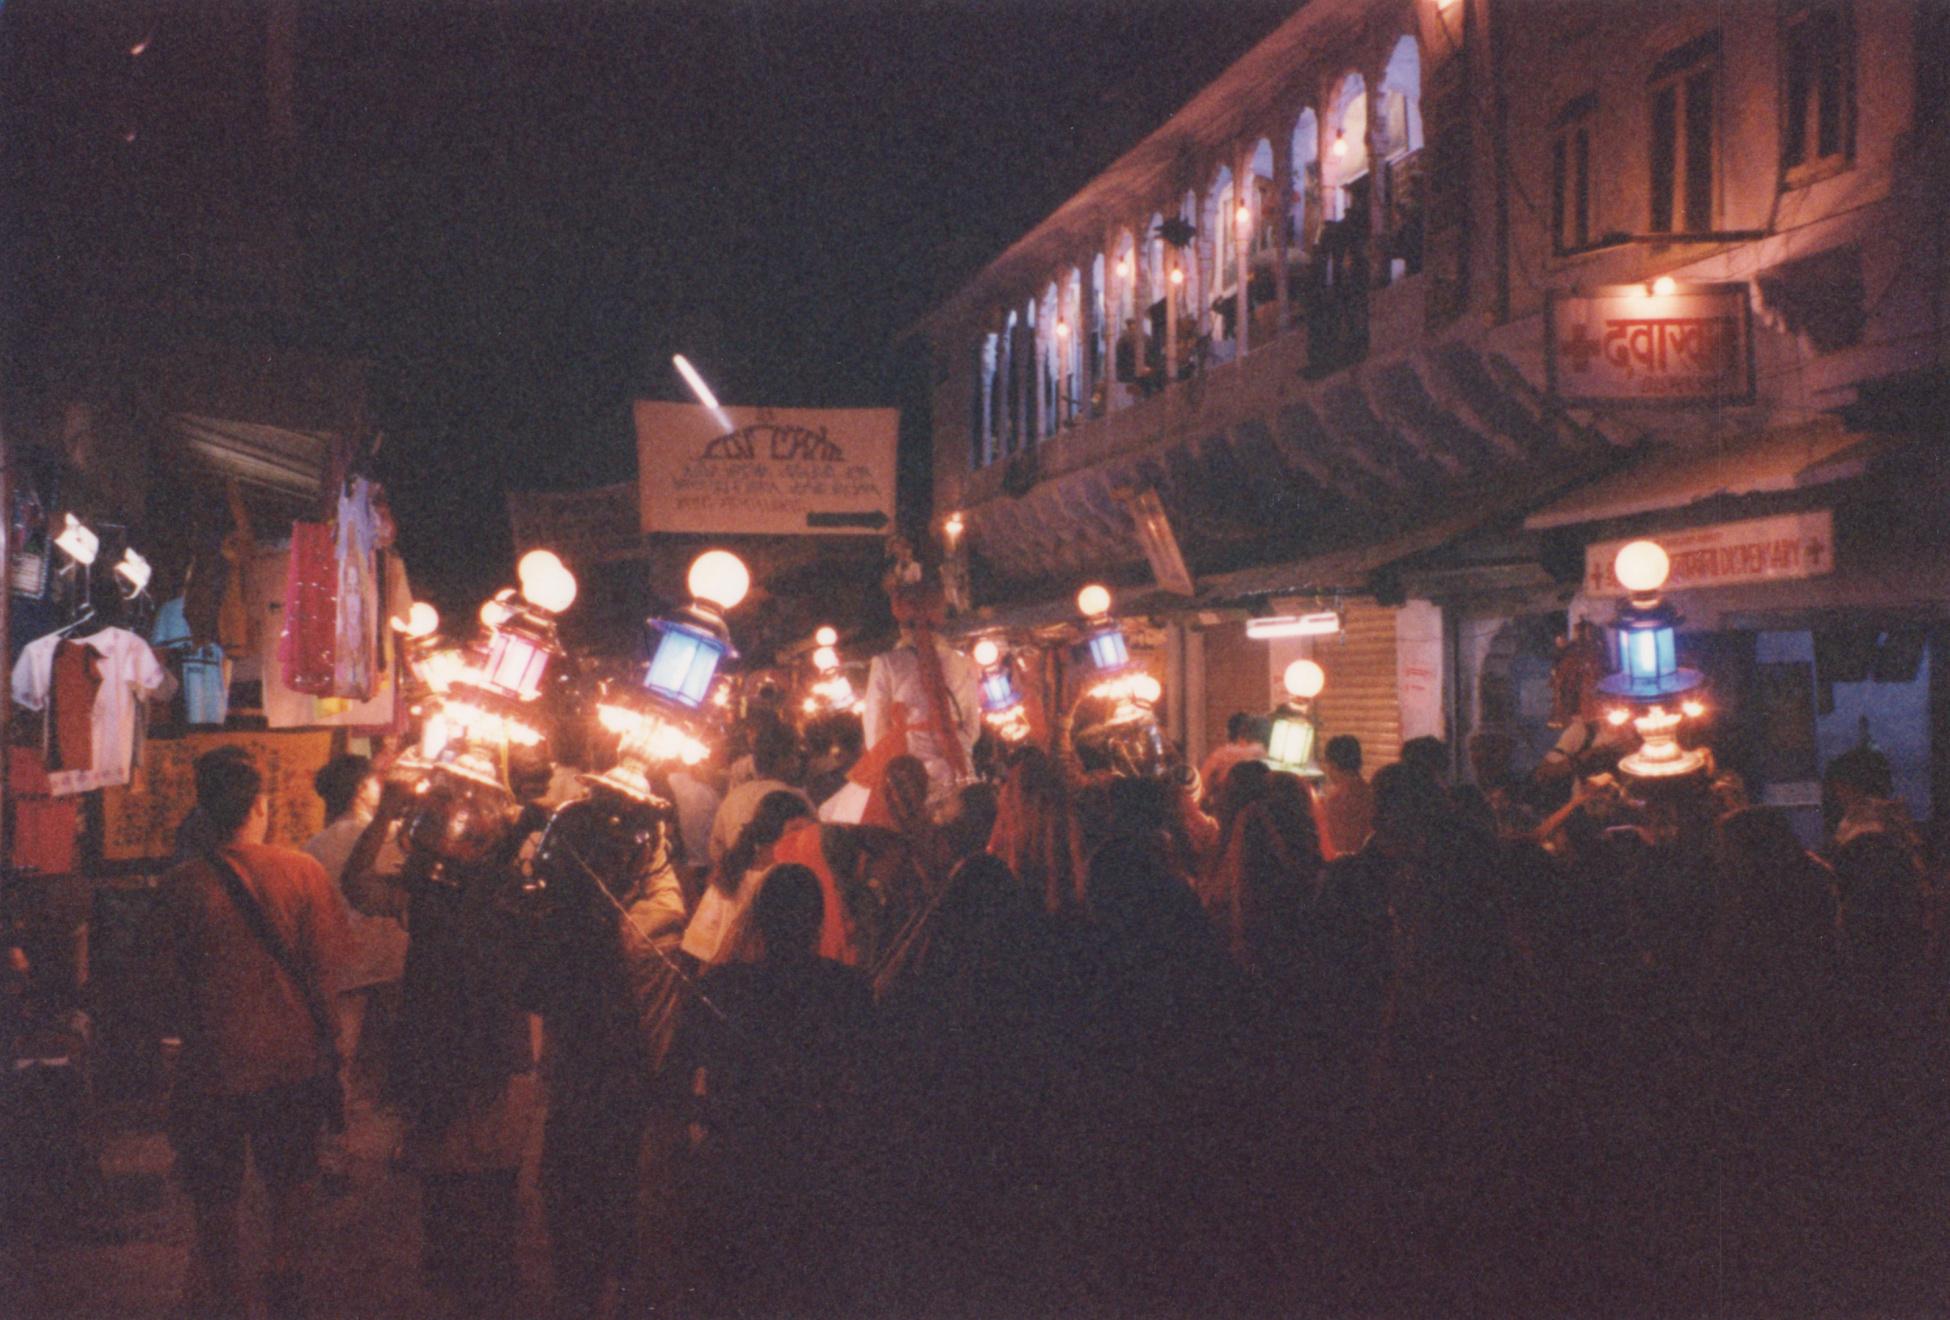 iuliana night nighttime dark evening parade lamp light lights procession